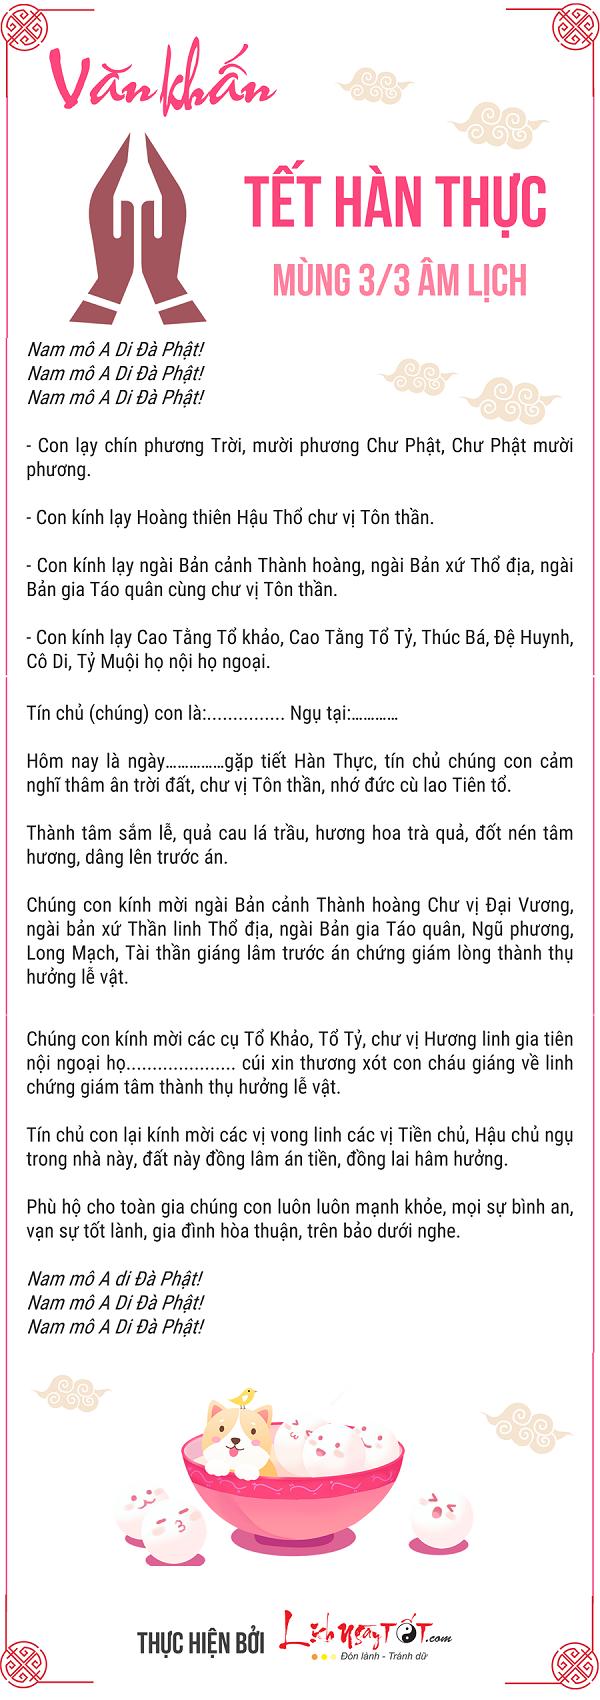 Bai khan tet Han Thuc mung 3 thang 3